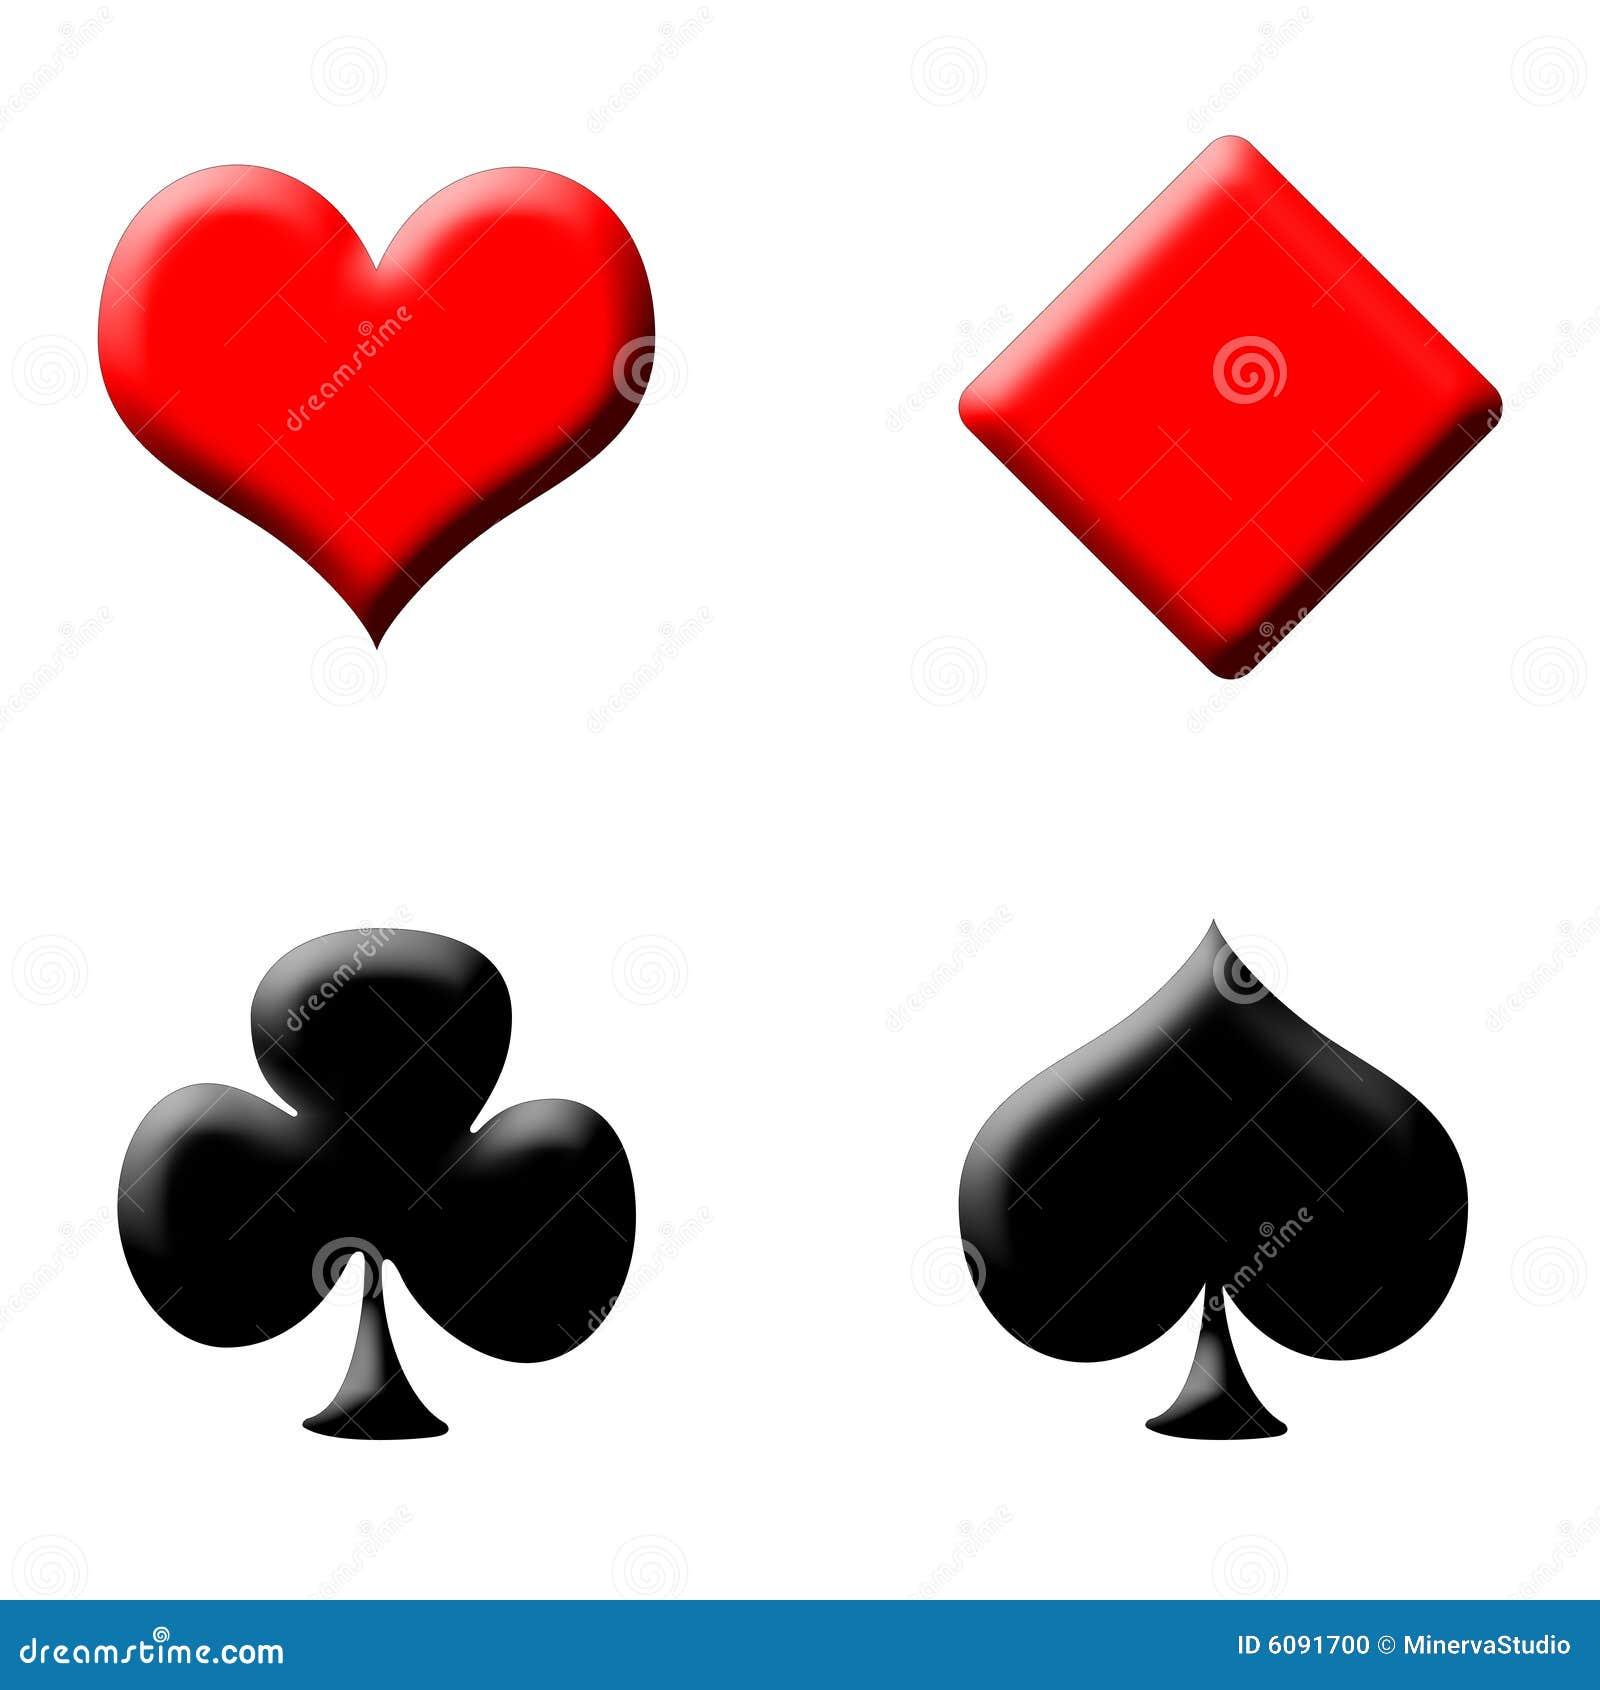 Dm poker live stream